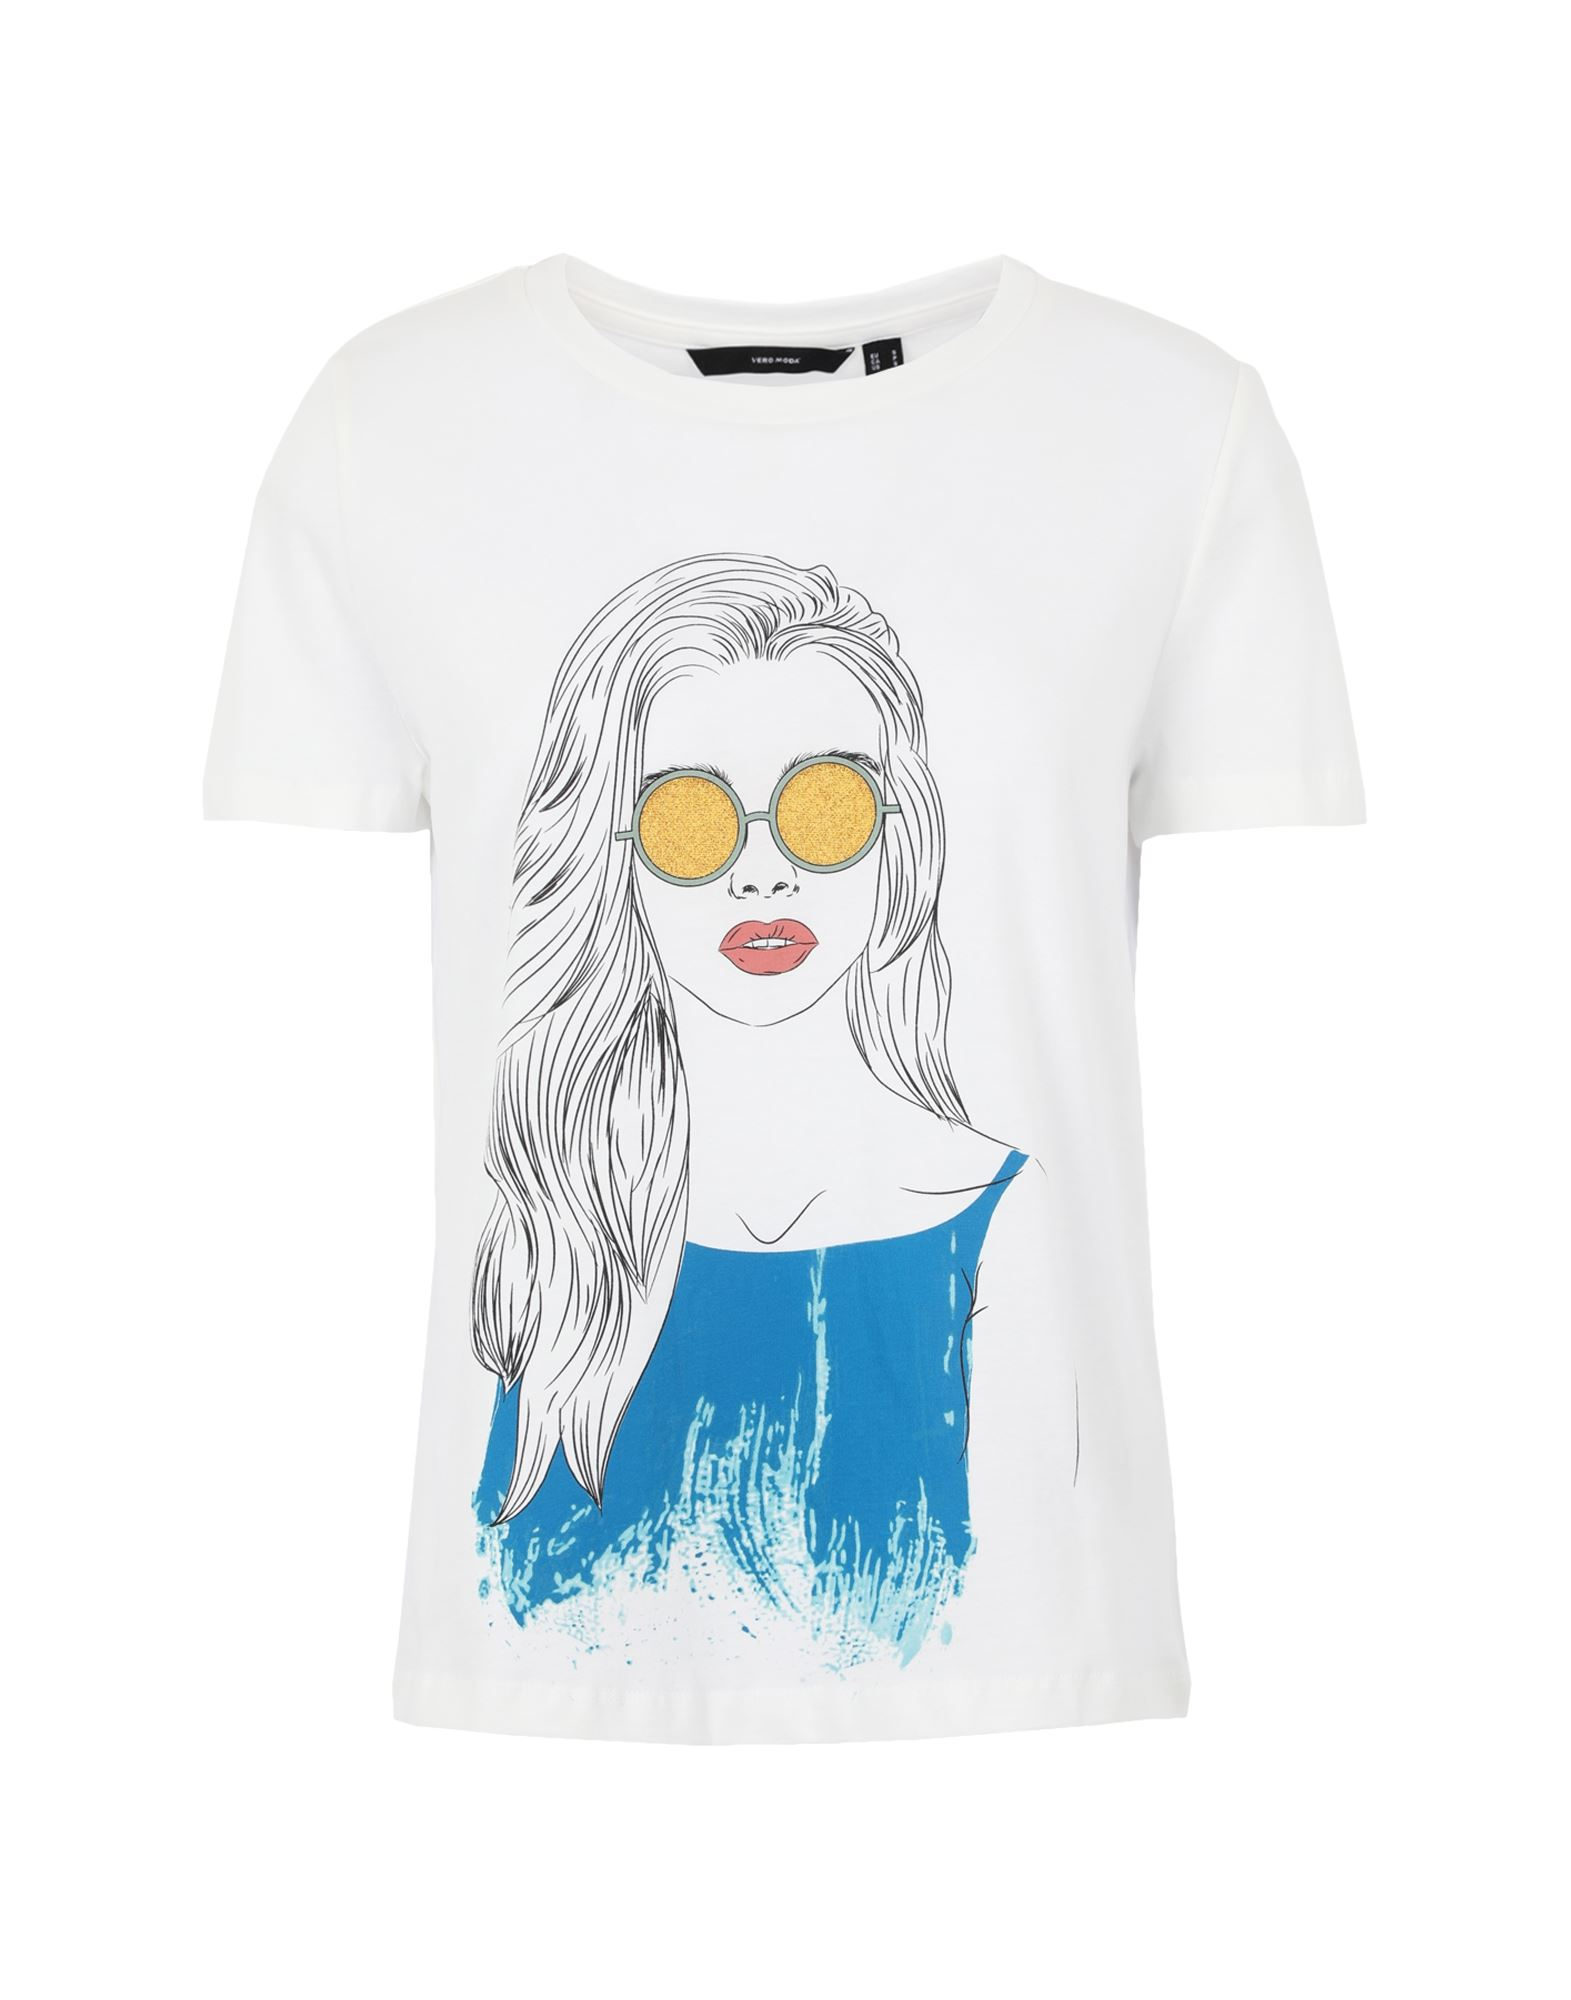 VERO MODA Футболка футболка vero moda 10195723 размер xs серый